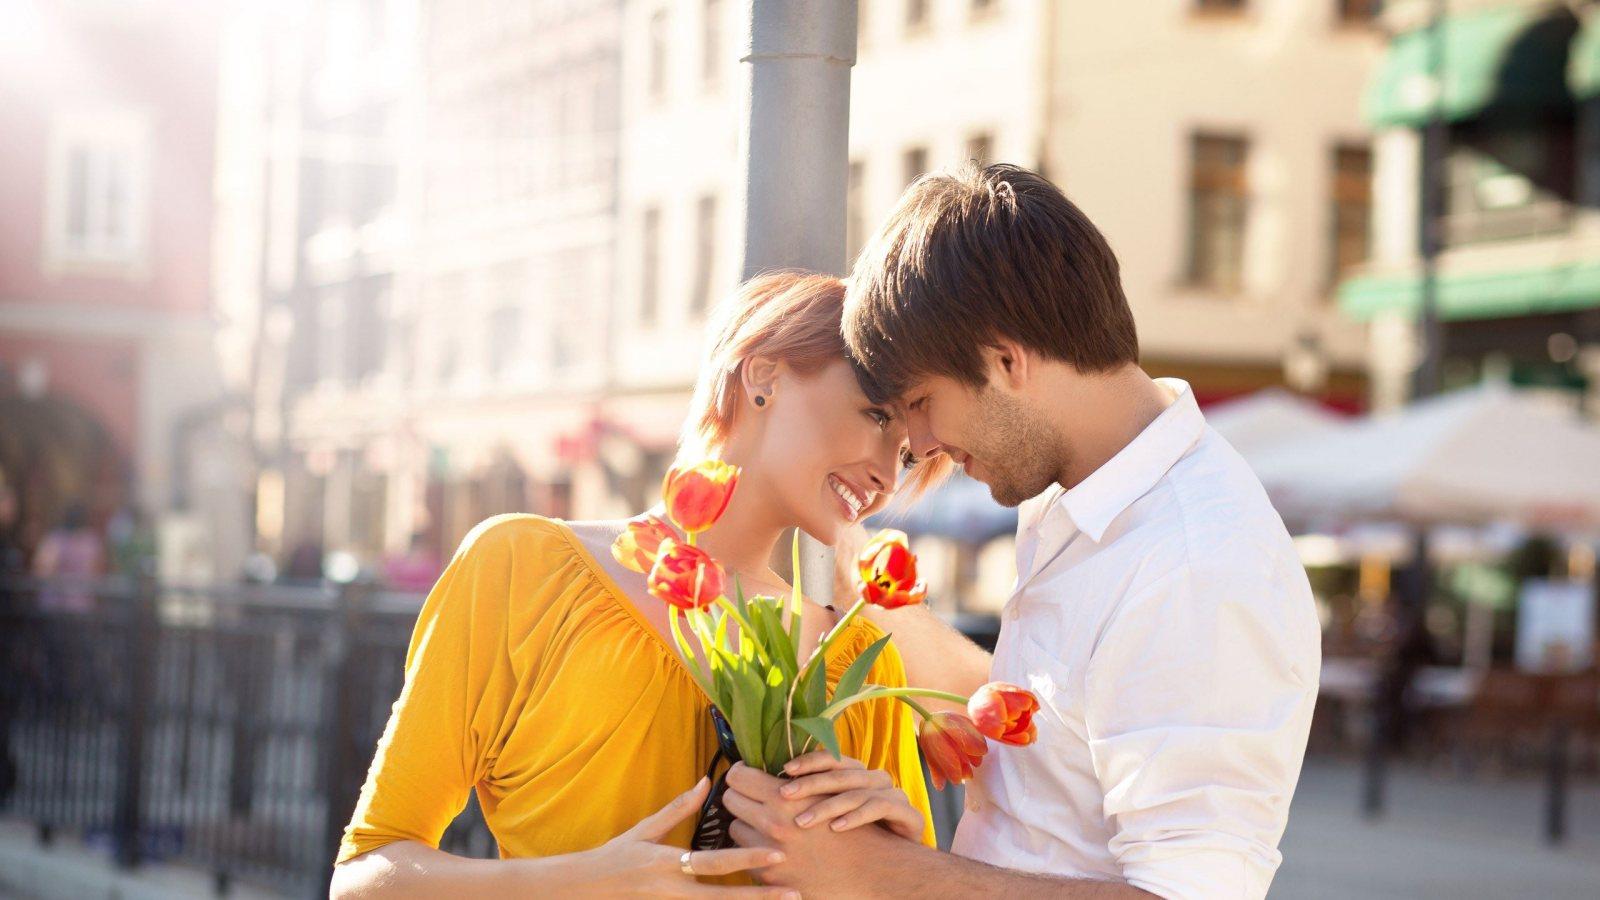 http://2.bp.blogspot.com/-jZa_0kkLIC0/UE_7LB13VuI/AAAAAAAAGOk/zHr6gj__r6Y/s1600/beautiful-in-love-couple-1600x900.jpg